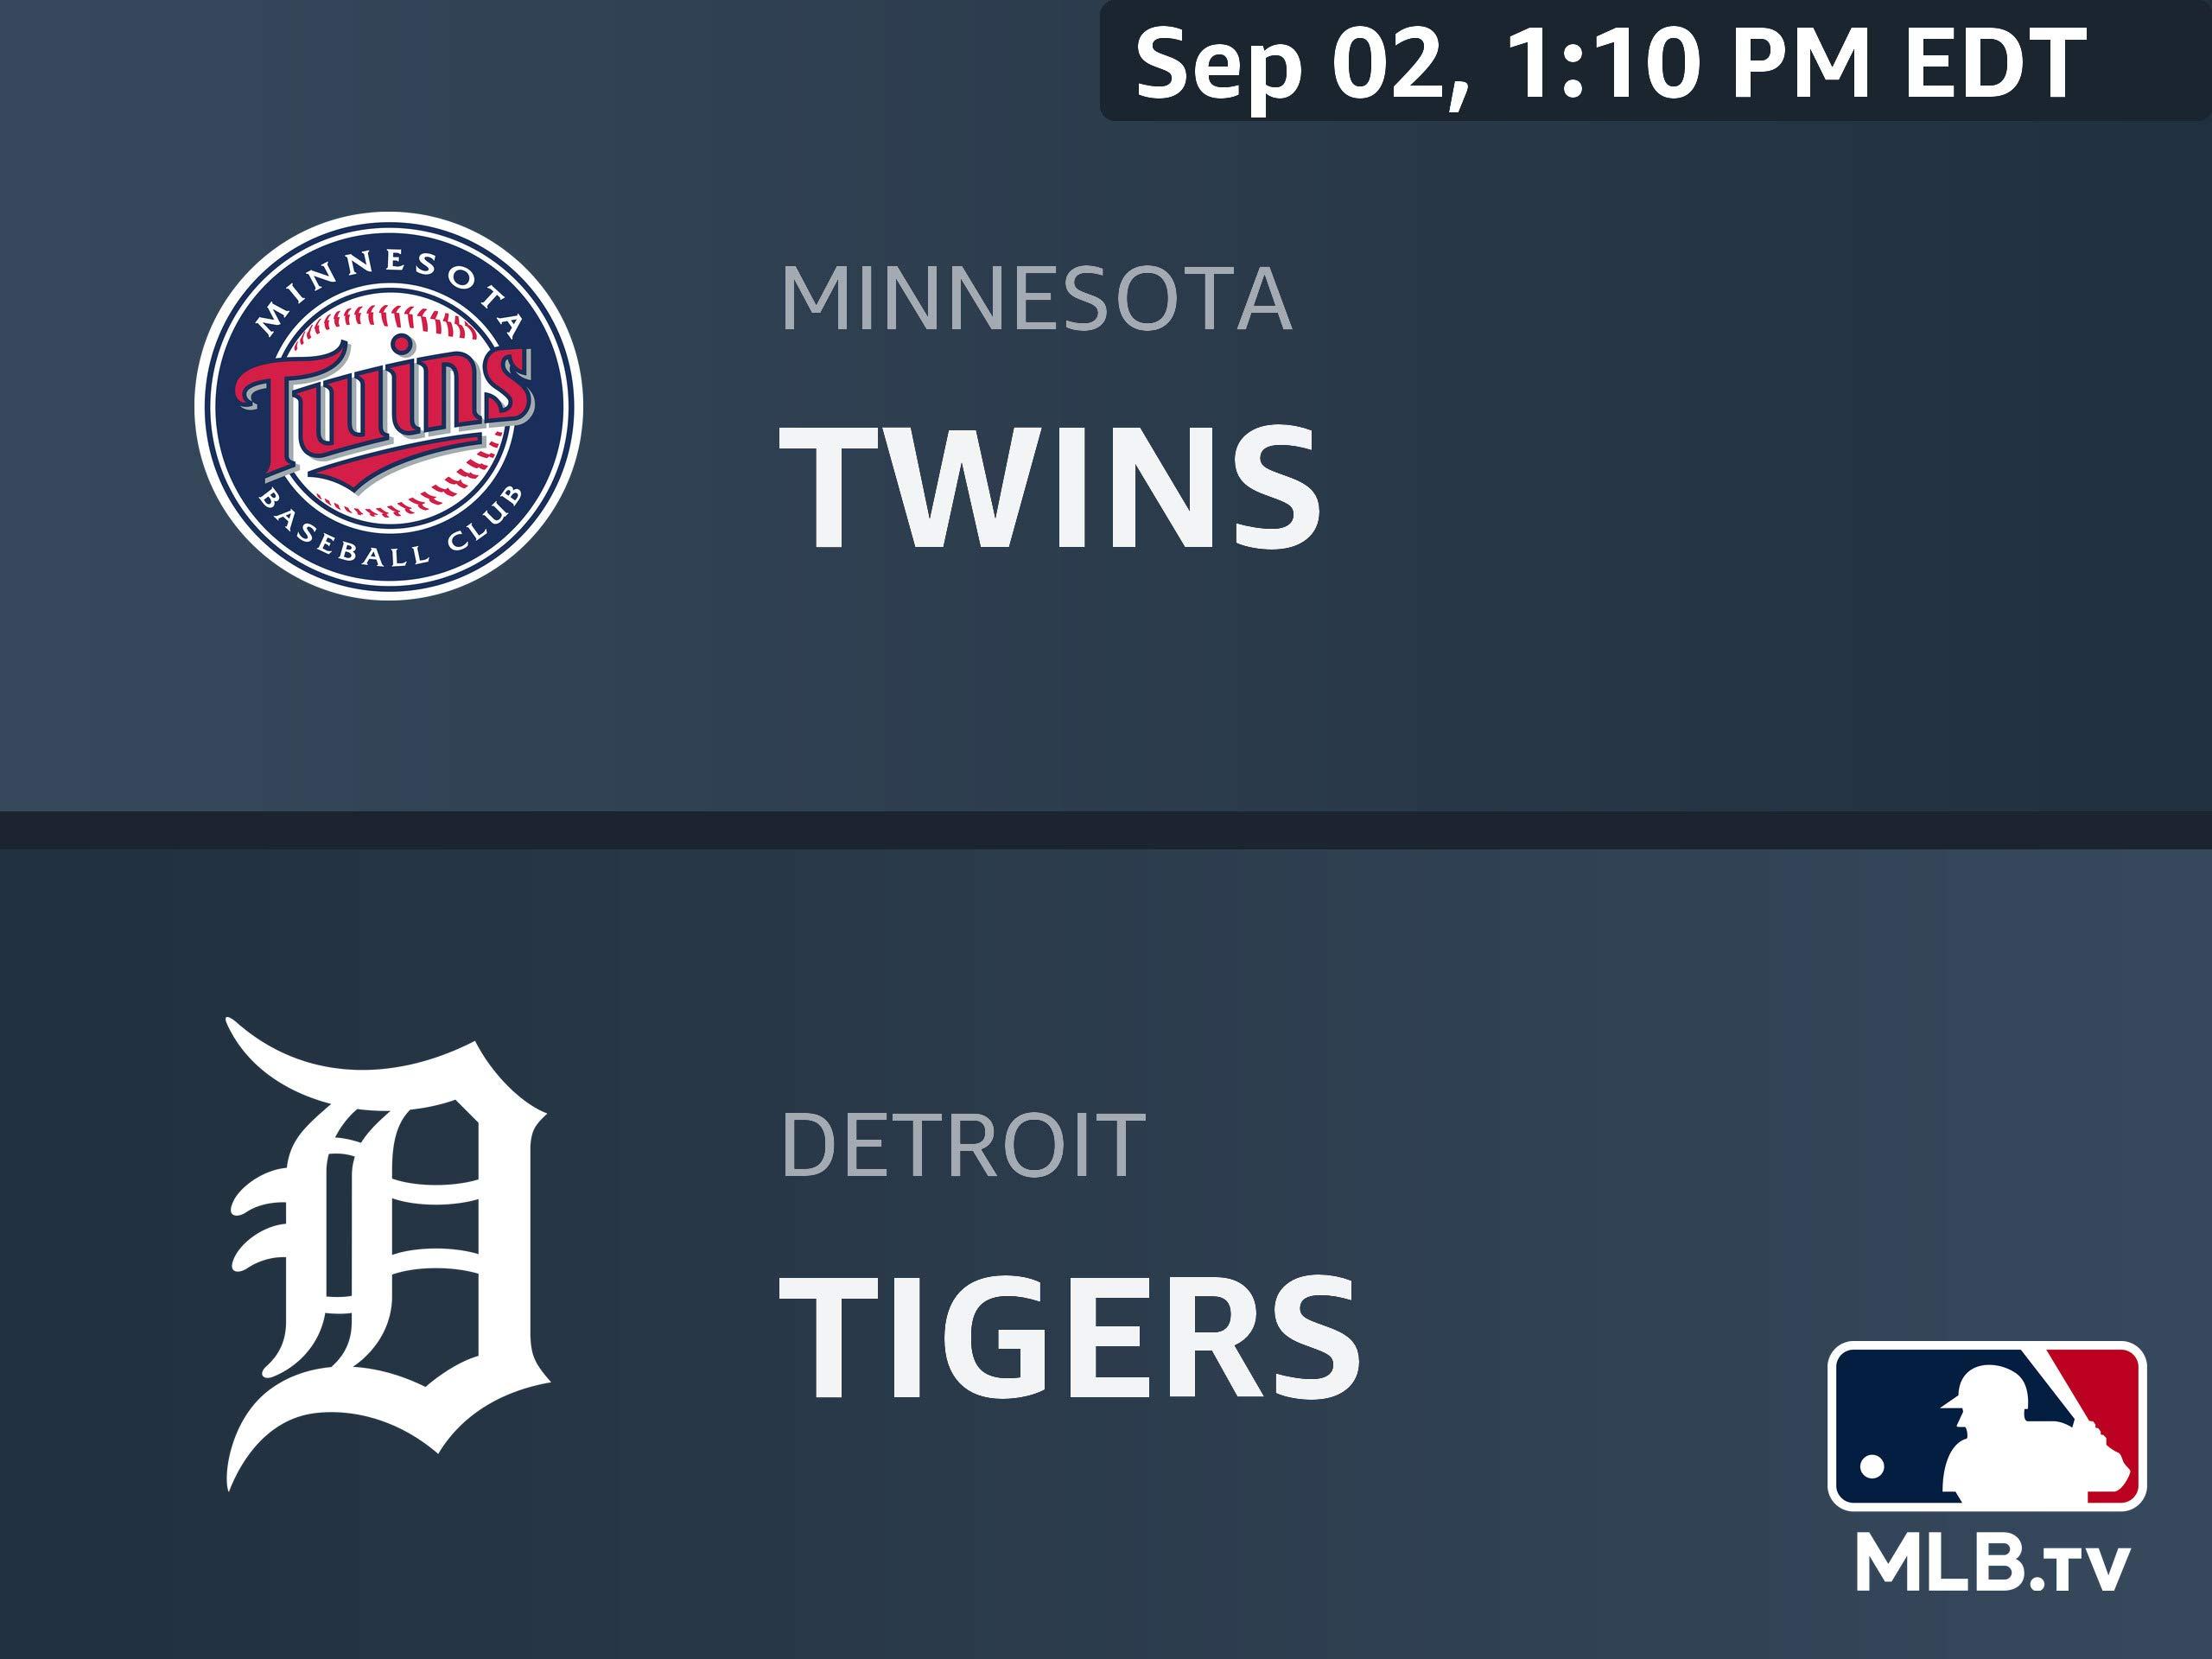 Amazon.com: Minnesota Twins at Detroit Tigers